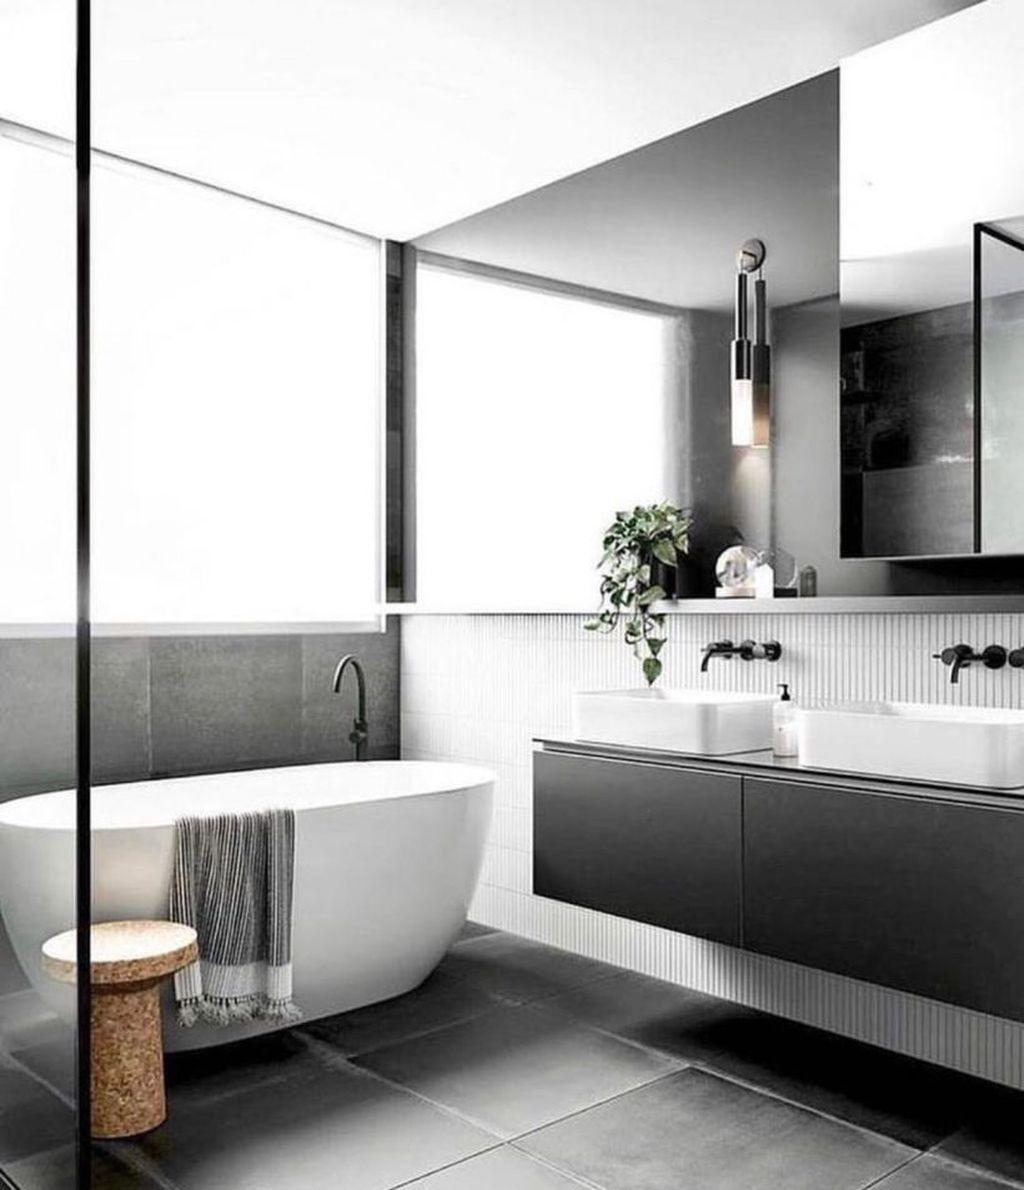 Best Minimalist Bathroom Design Ideas That Trendy Now 15